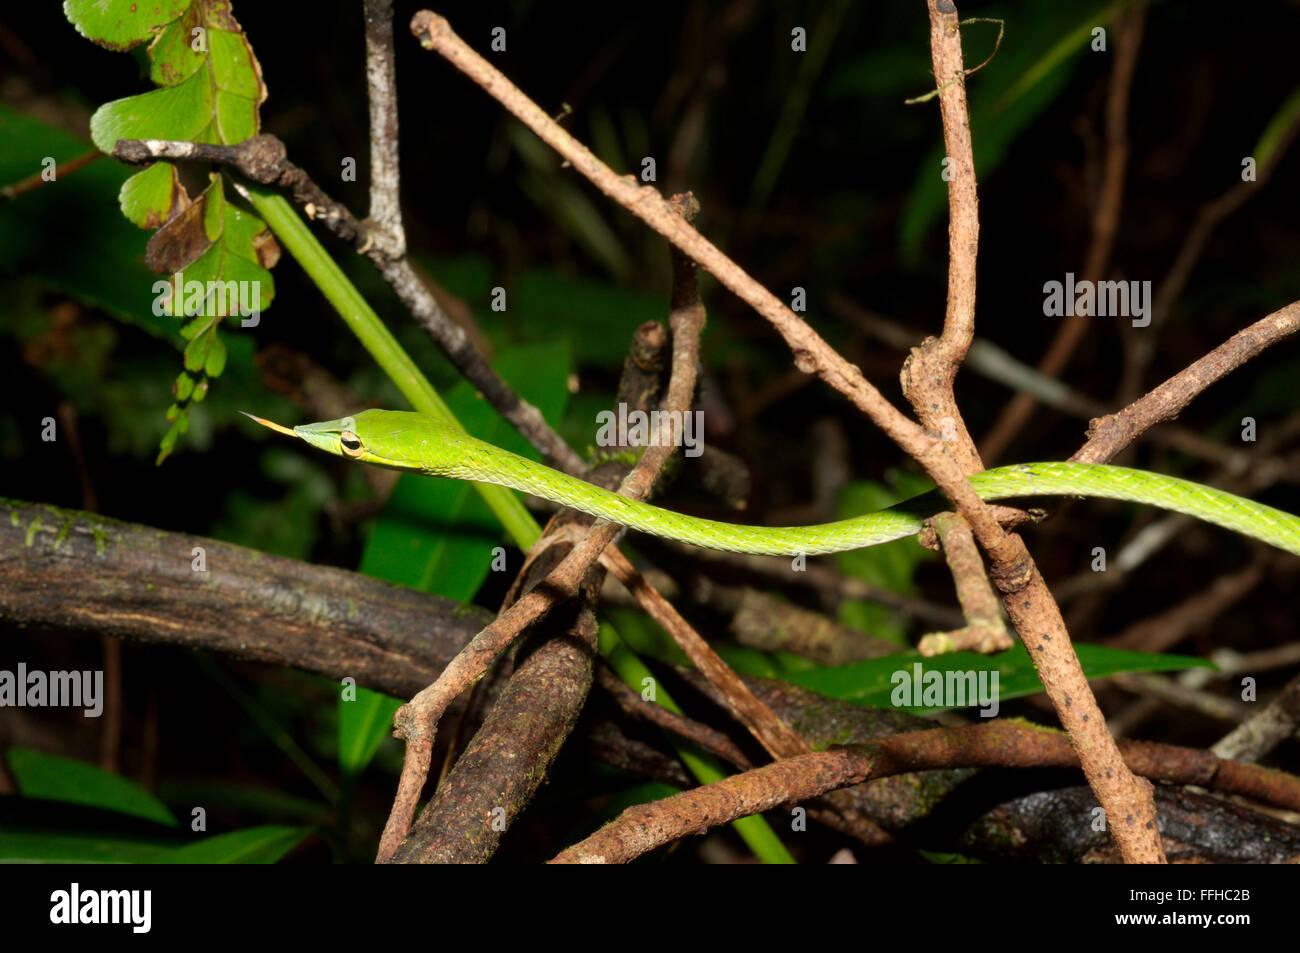 March 3, 2016 - Long-nosed Tree Snake, Green vine snake, Long-nosed Whip Snake or Asian vine snake (Ahaetulla nasuta) Sinharaja Forest Reserve, national park, Sinharaja, Sri Lanka, South Asia. © Andrey Nekrasov/ZUMA Wire/ZUMAPRESS.com/Alamy Live News Stock Photo